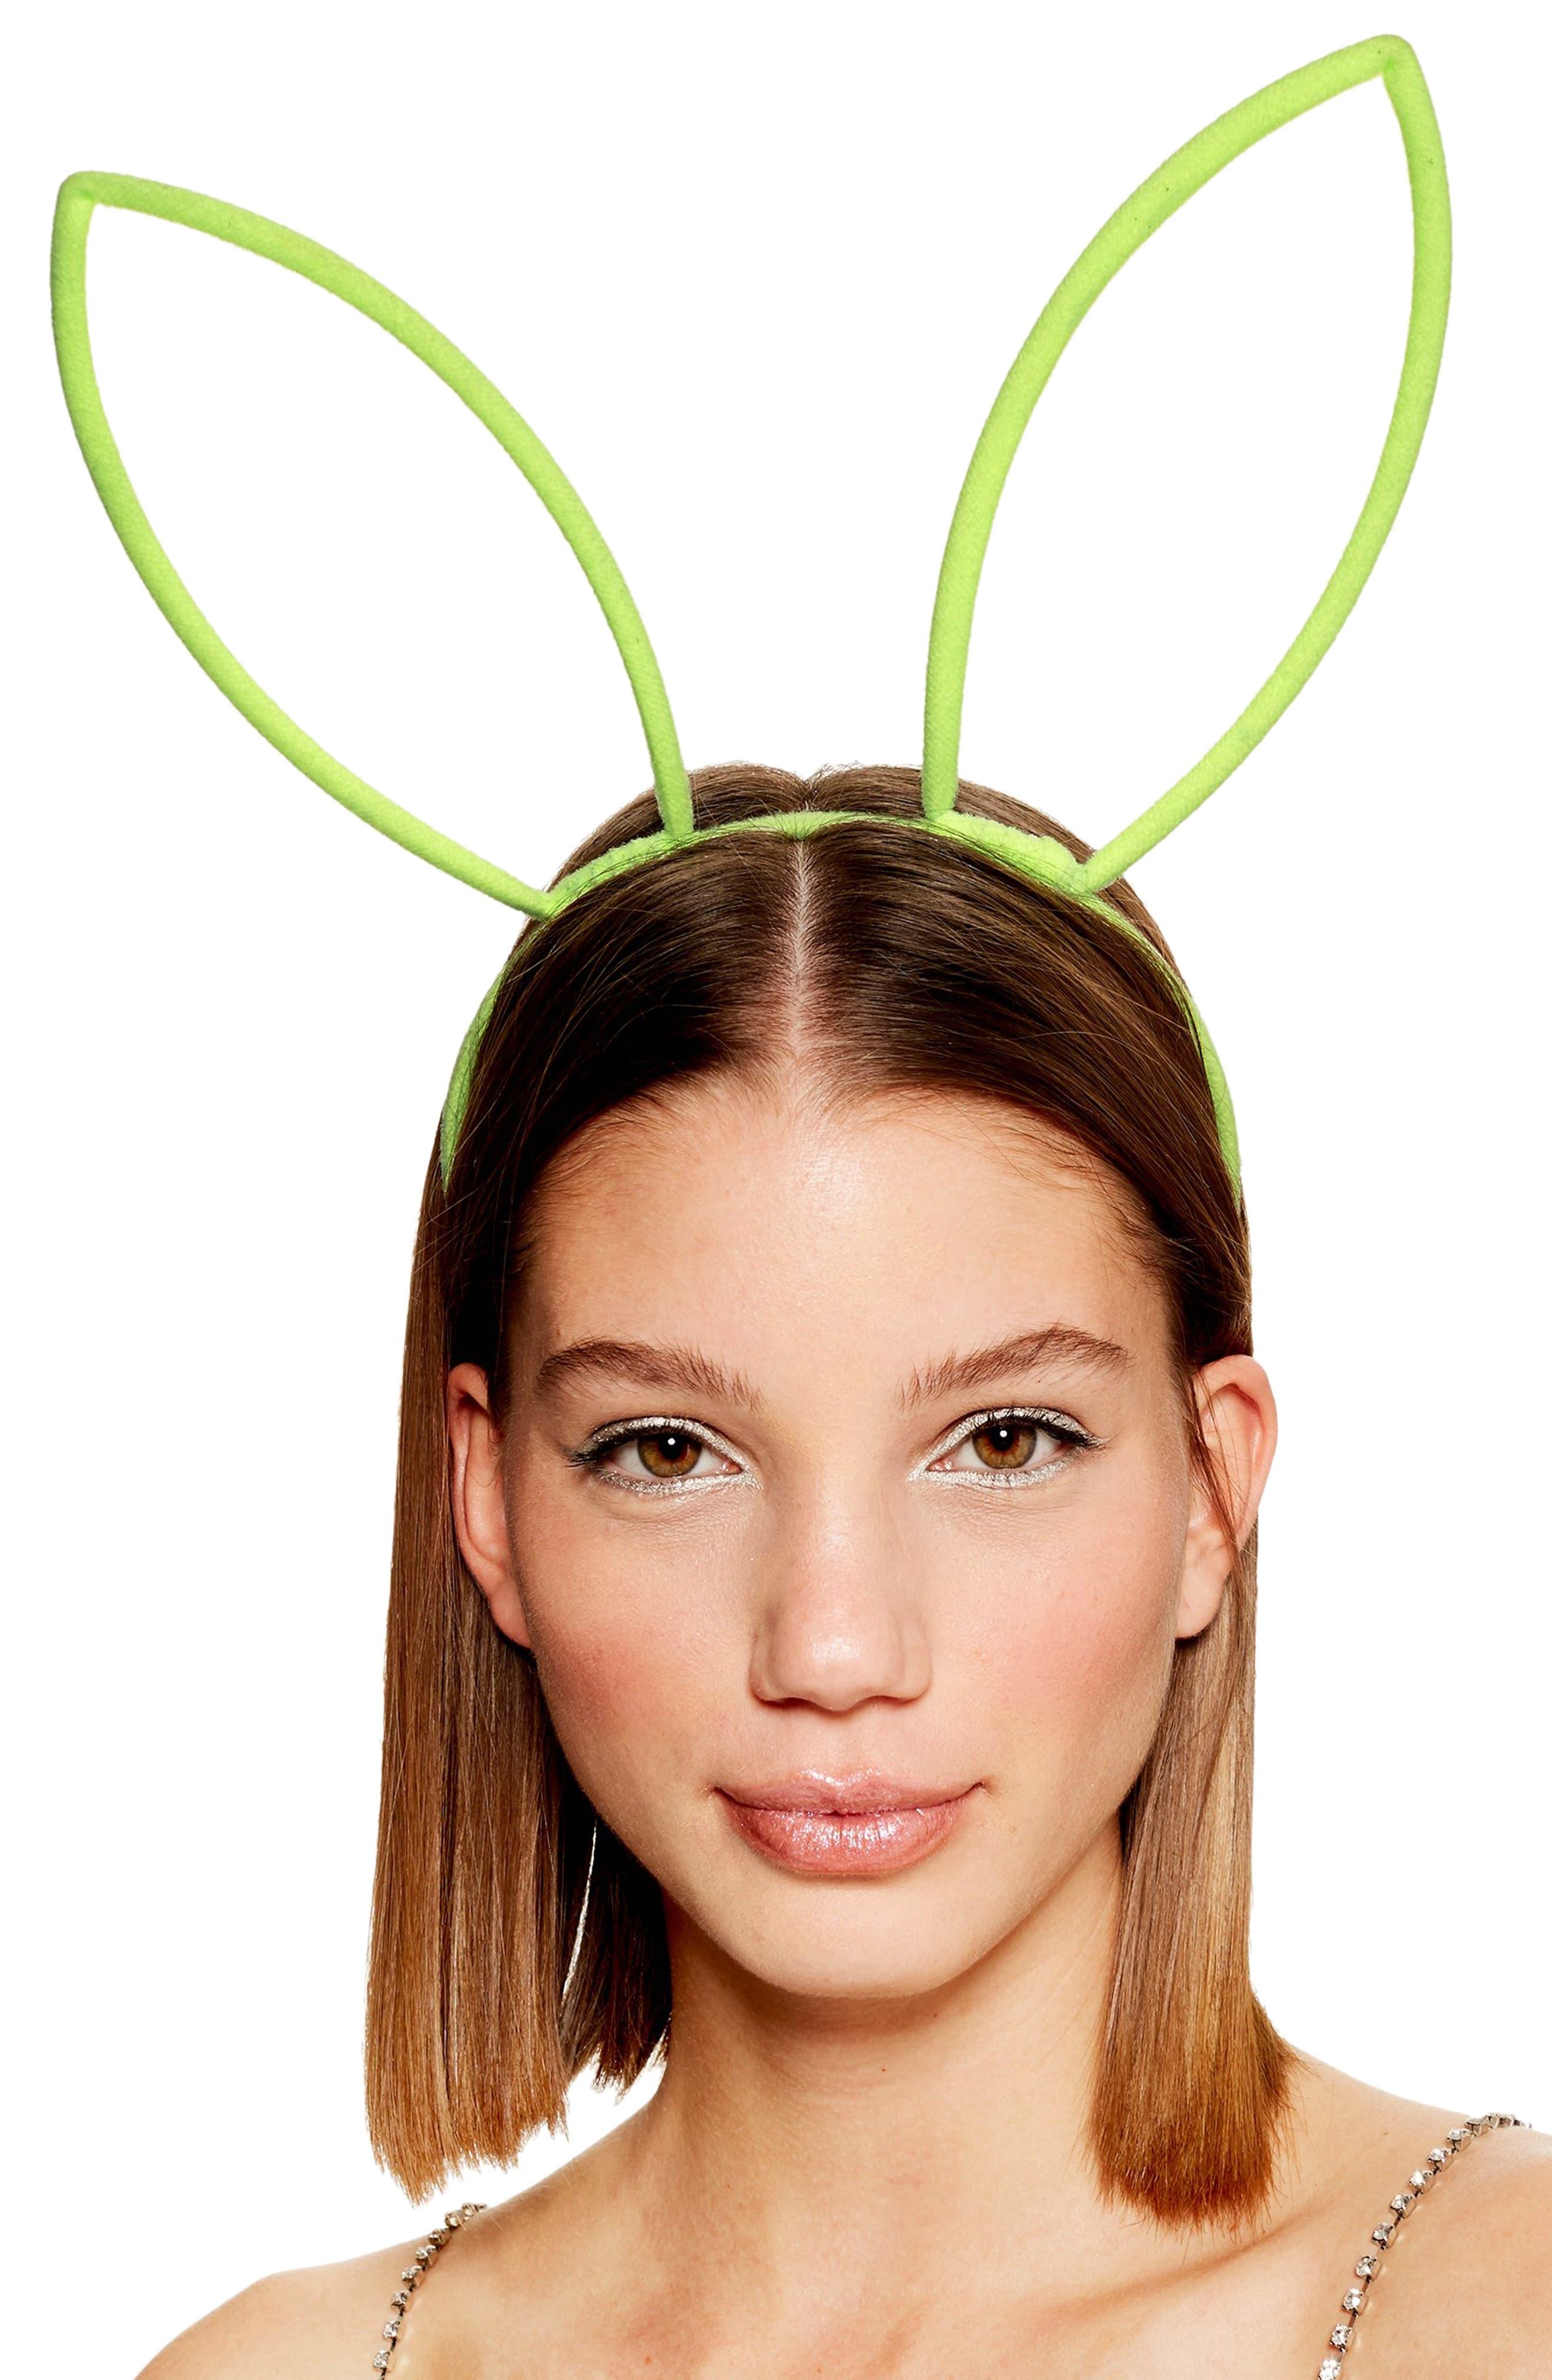 Glow Bunny Ear Headband,                             Alternate thumbnail 2, color,                             GREEN